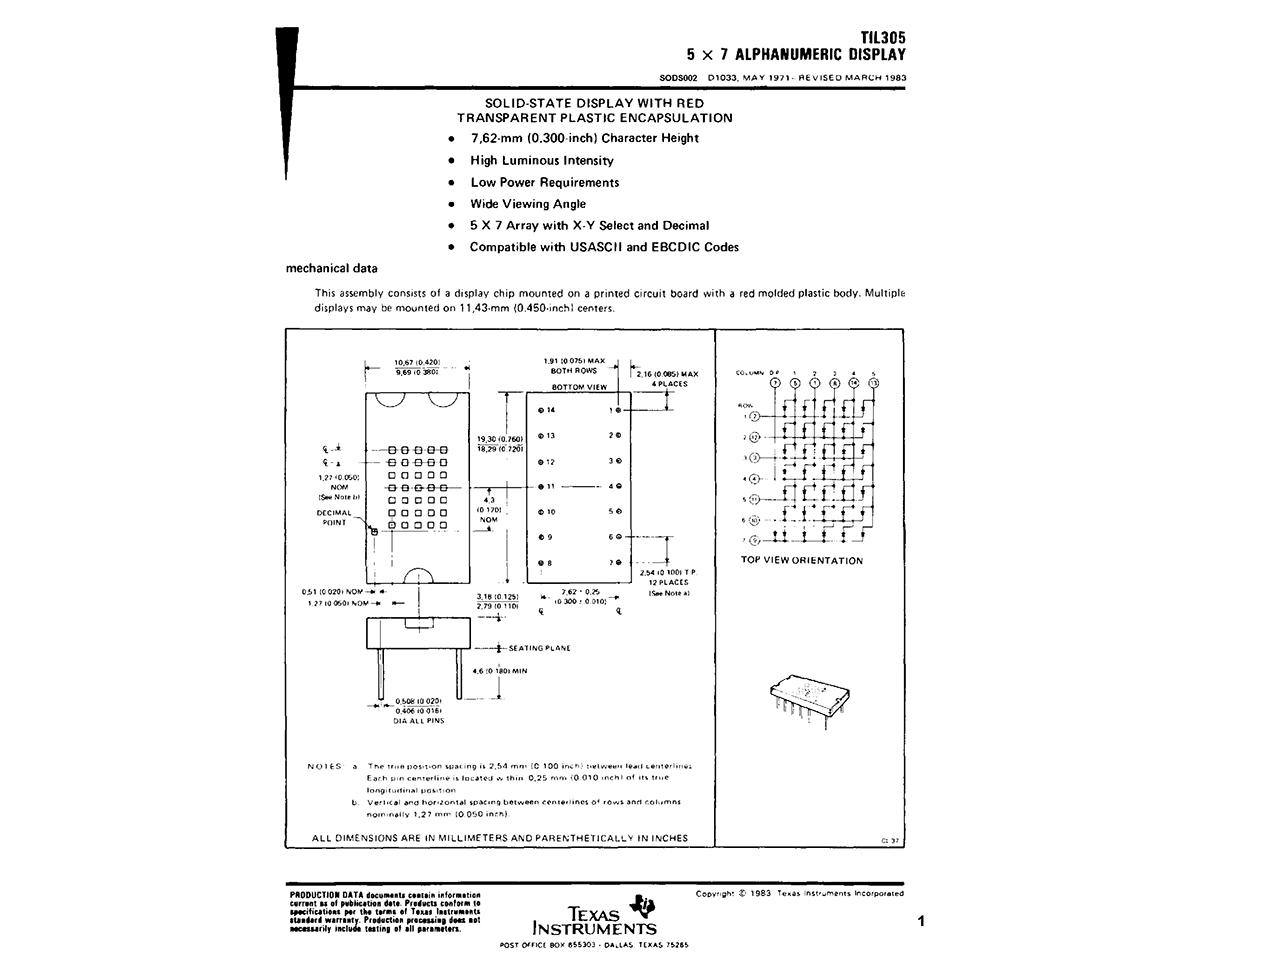 Texas Instruments datasheet